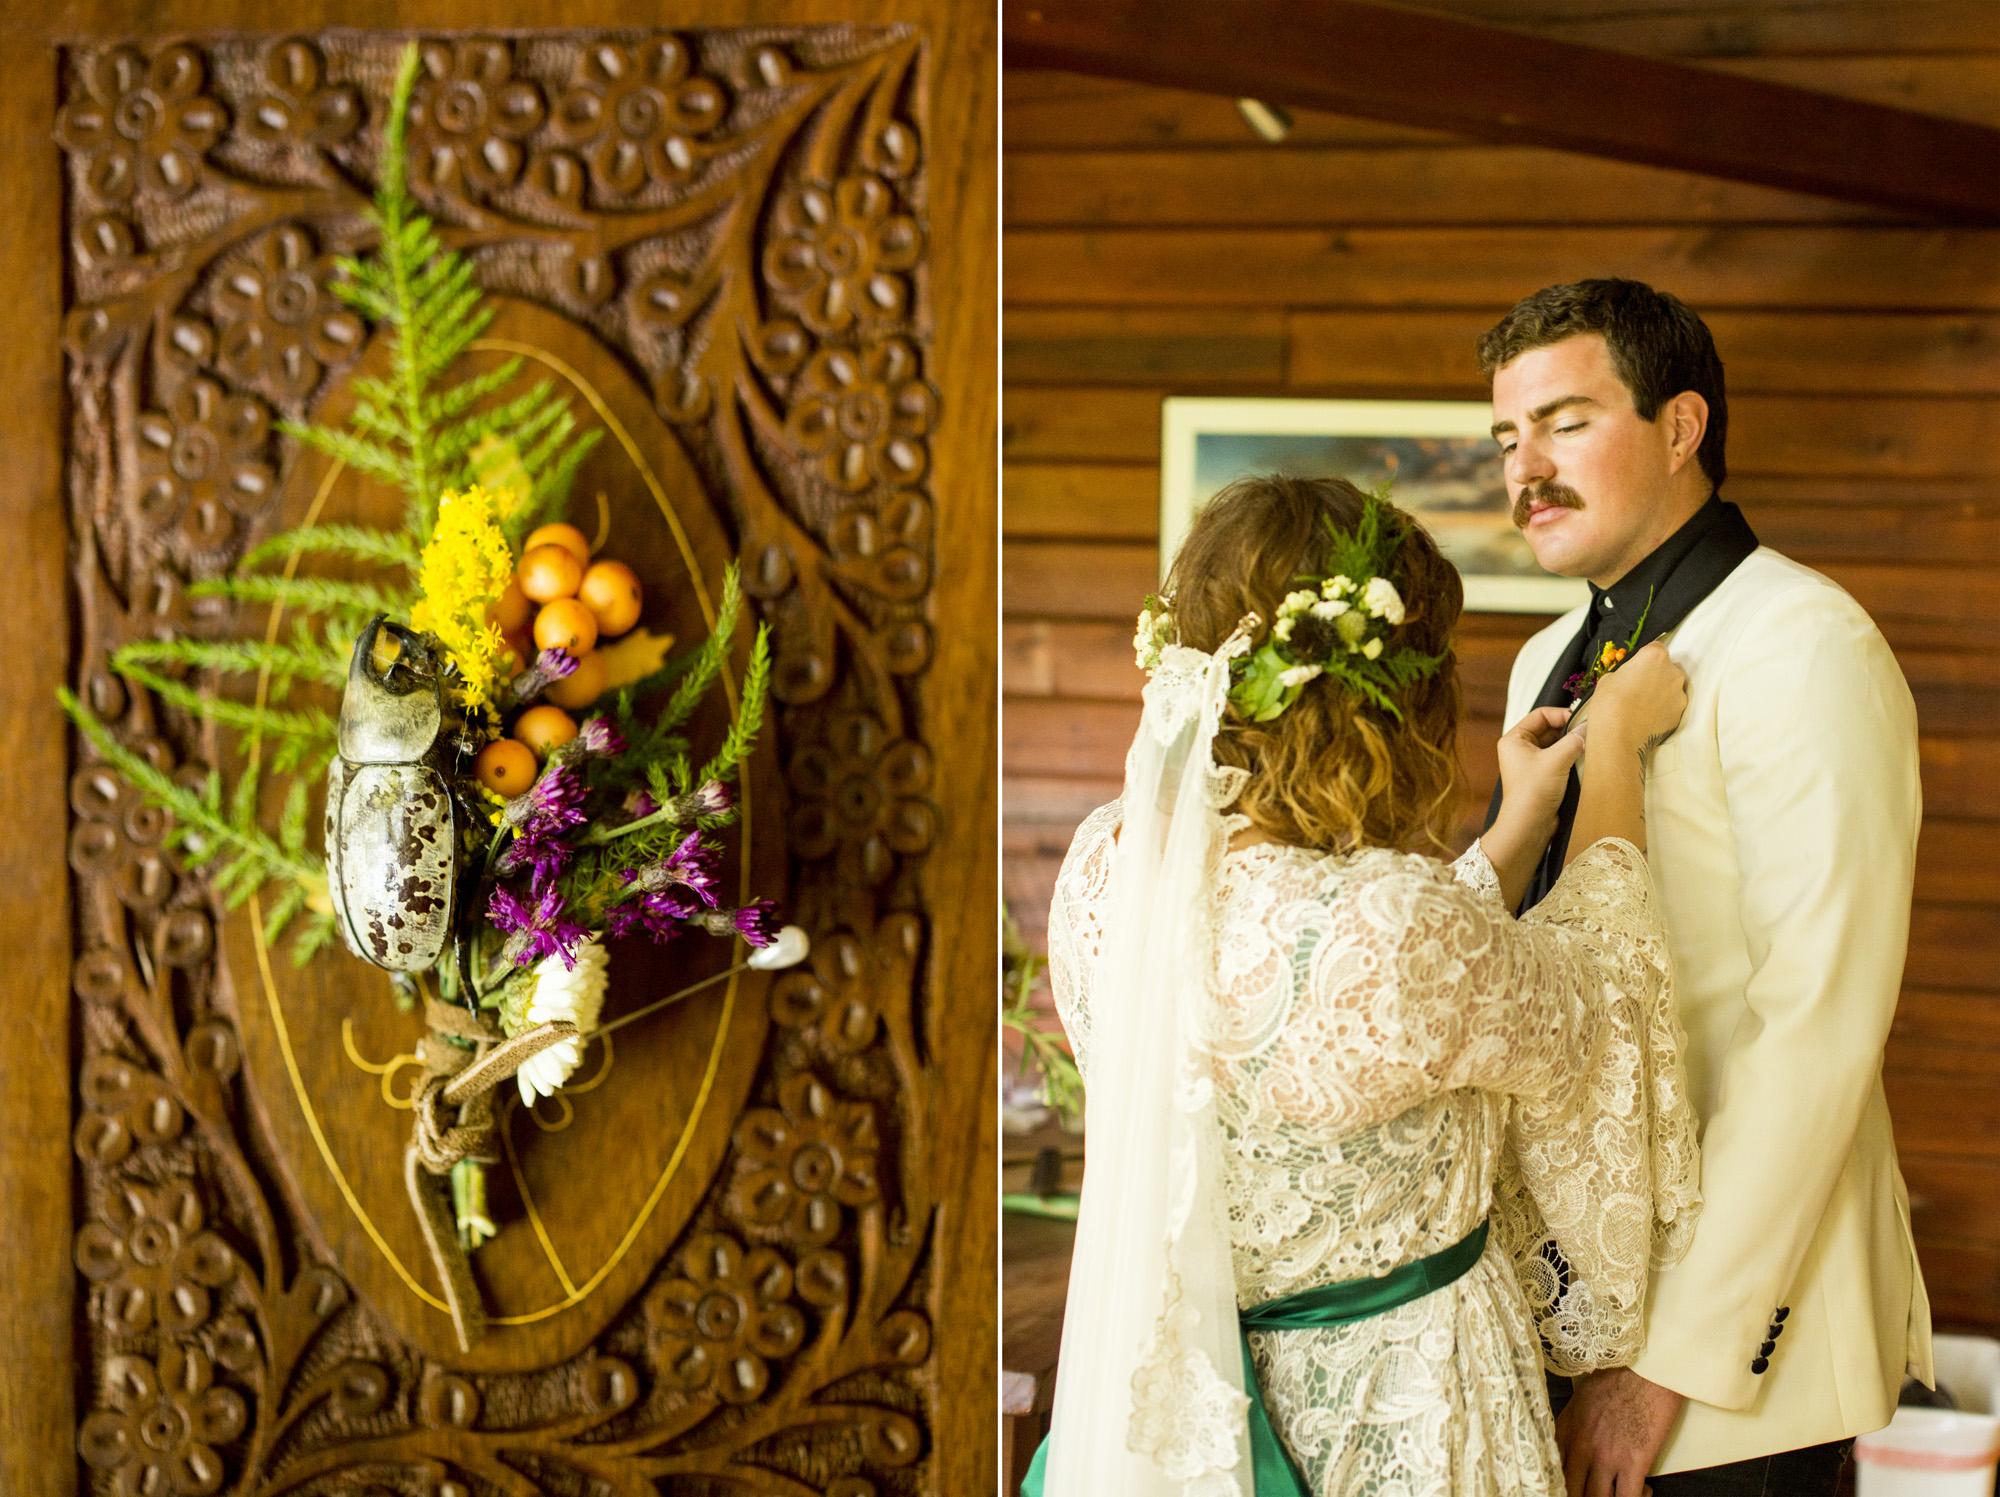 Seriously_Sabrina_Photography_Red_River_Gorge_Kentucky_Wedding_ShawnDana63.jpg